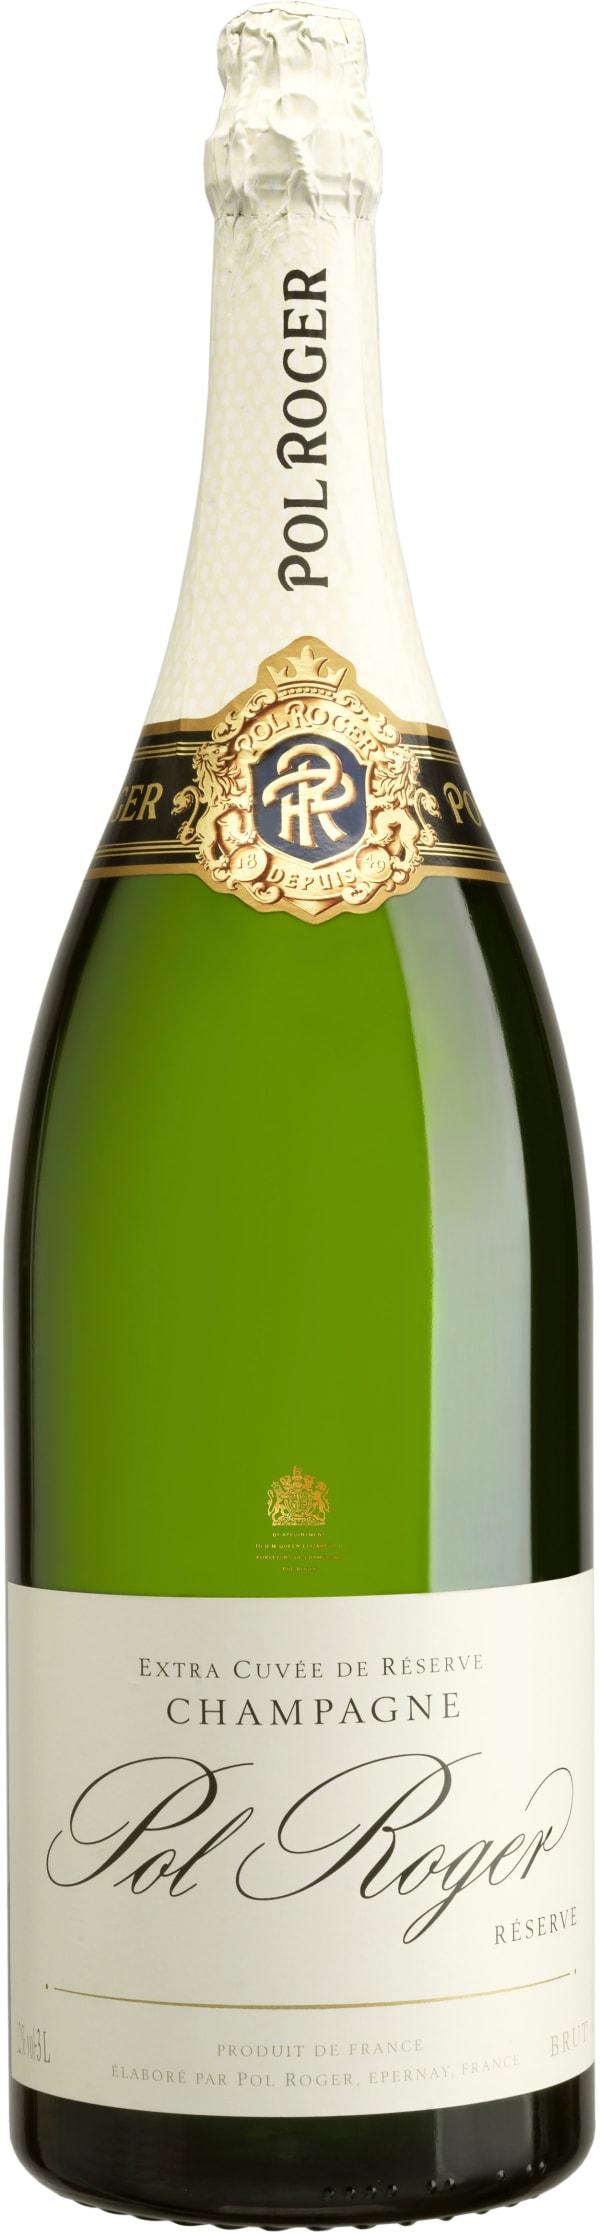 Pol Roger Réserve Champagne Brut, Jeroboam